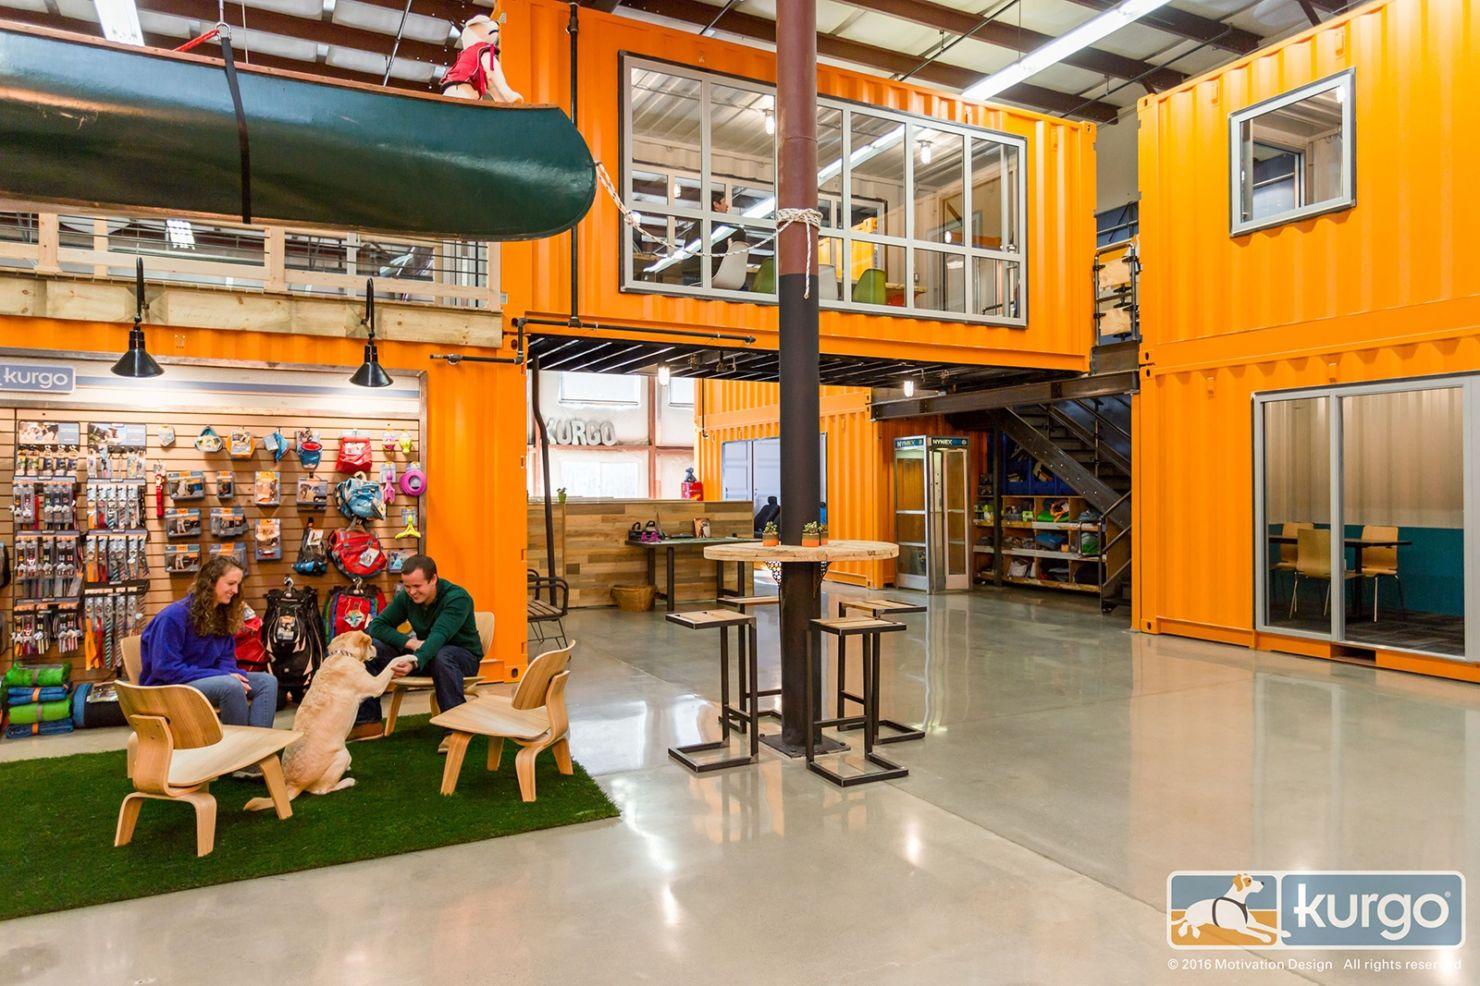 Kurgo - офіс в якому люблять собак. Фото 4